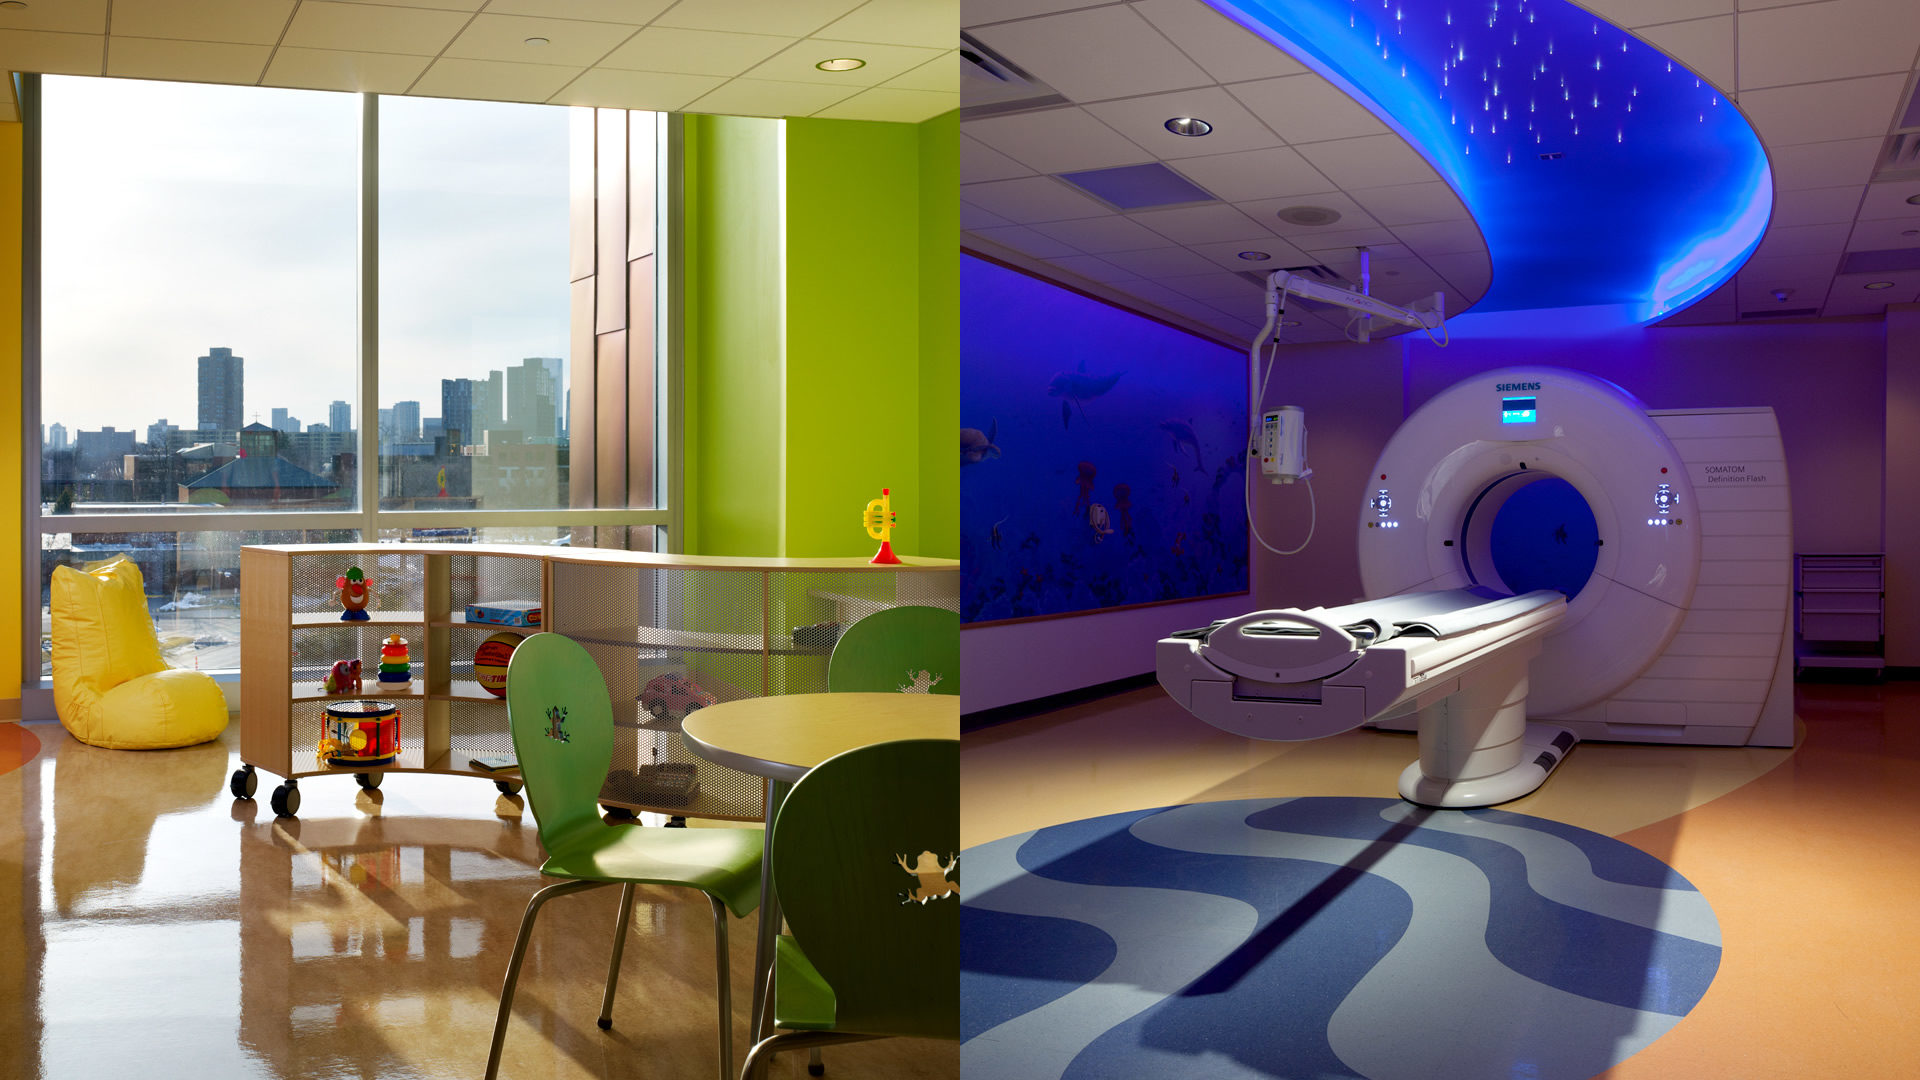 U of M Masonic Childrens Hospital Amplatz Childrens Play Room and MRI Suite